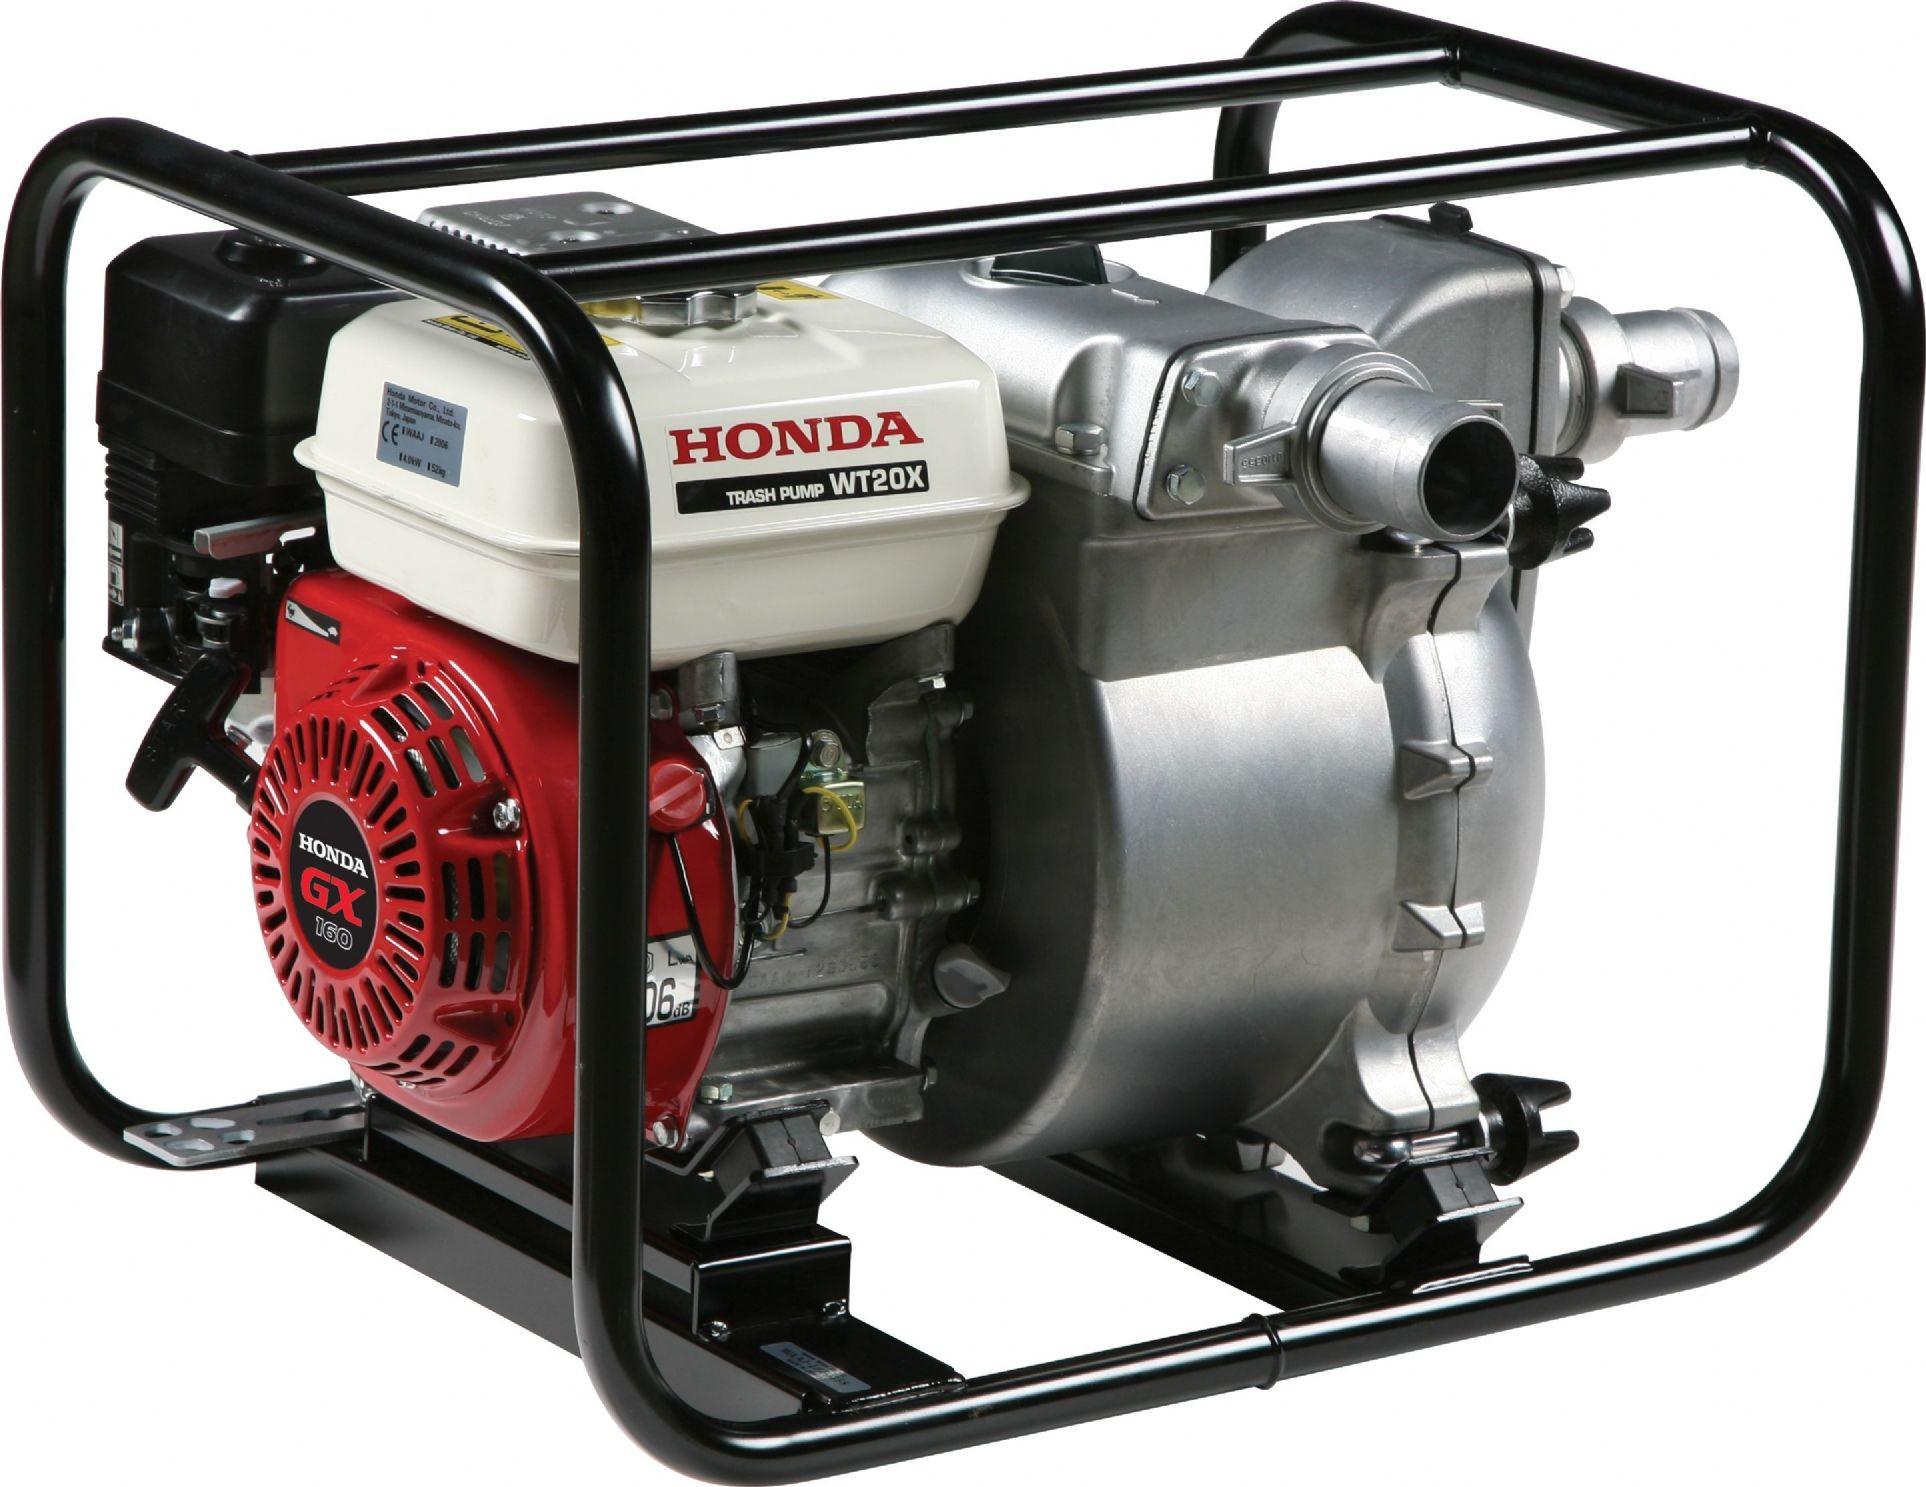 Outstanding Honda Water Pump Replacement Parts Reviewmotors Co Wiring 101 Ferenstreekradiomeanderfmnl